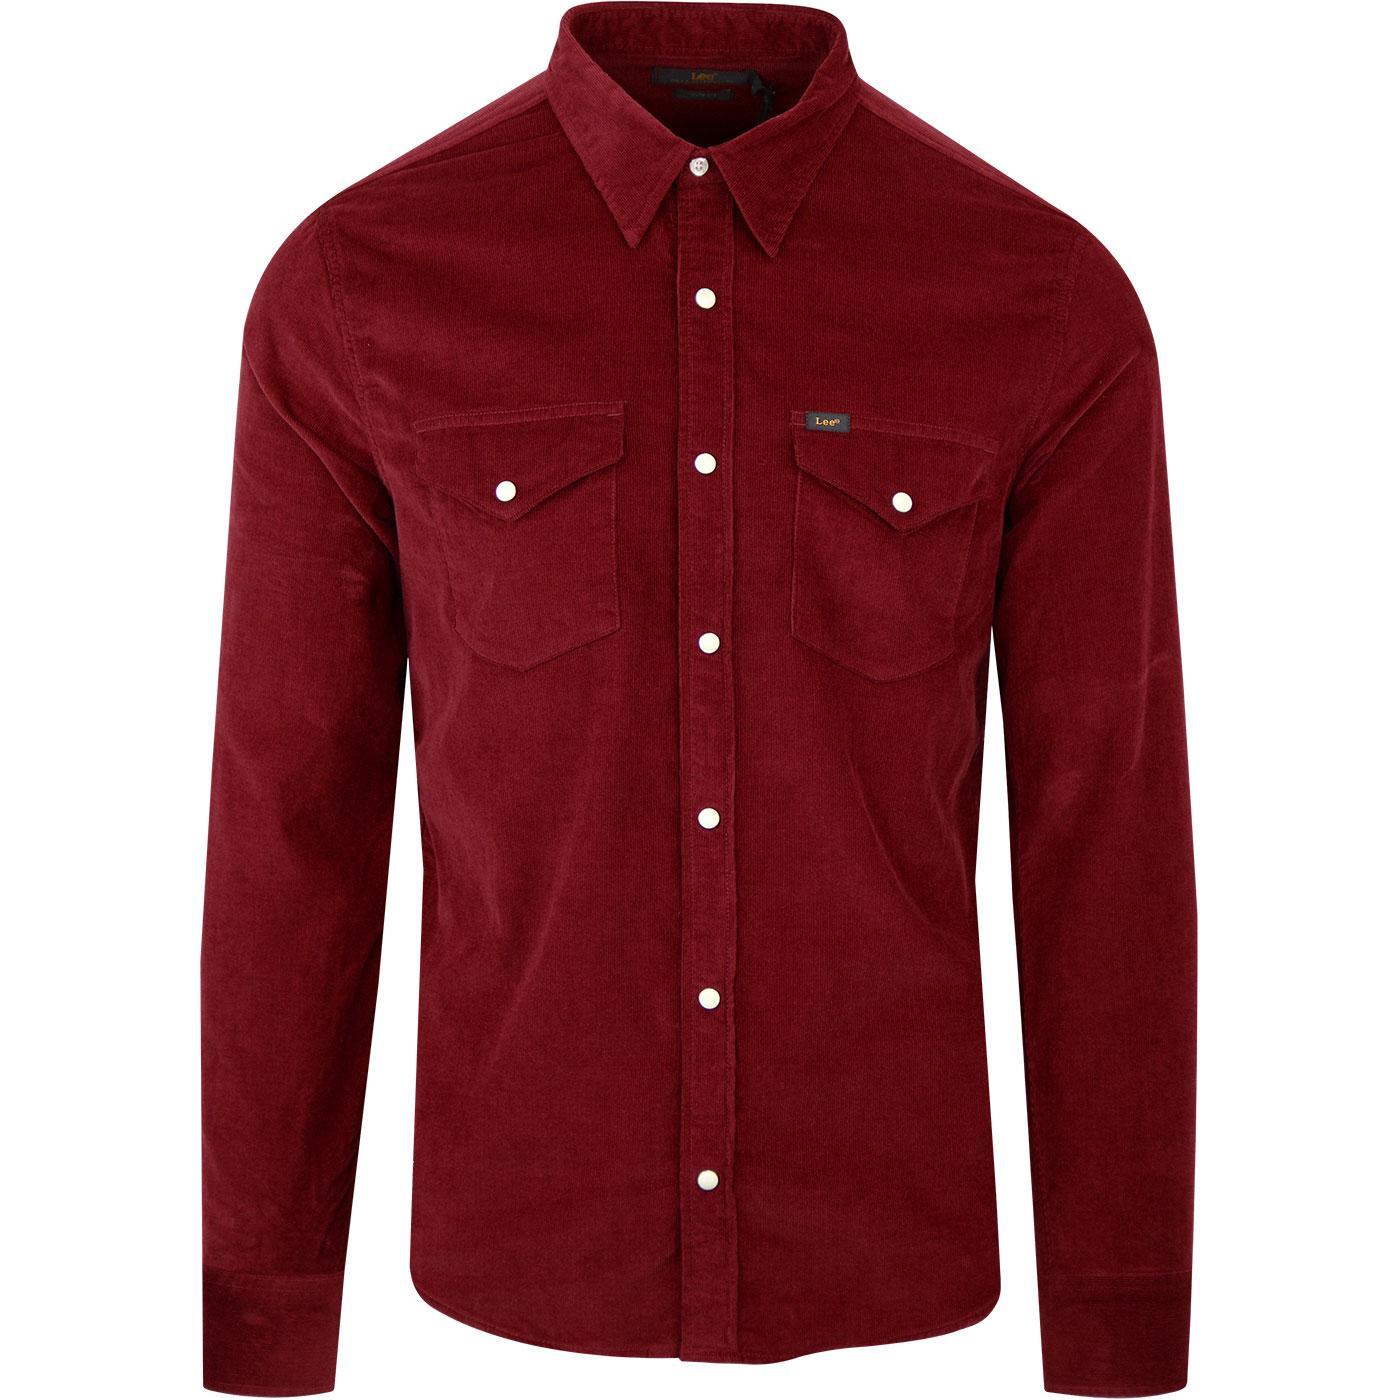 LEE Retro 70s Corduroy Western Shirt (Rhubarb Red)